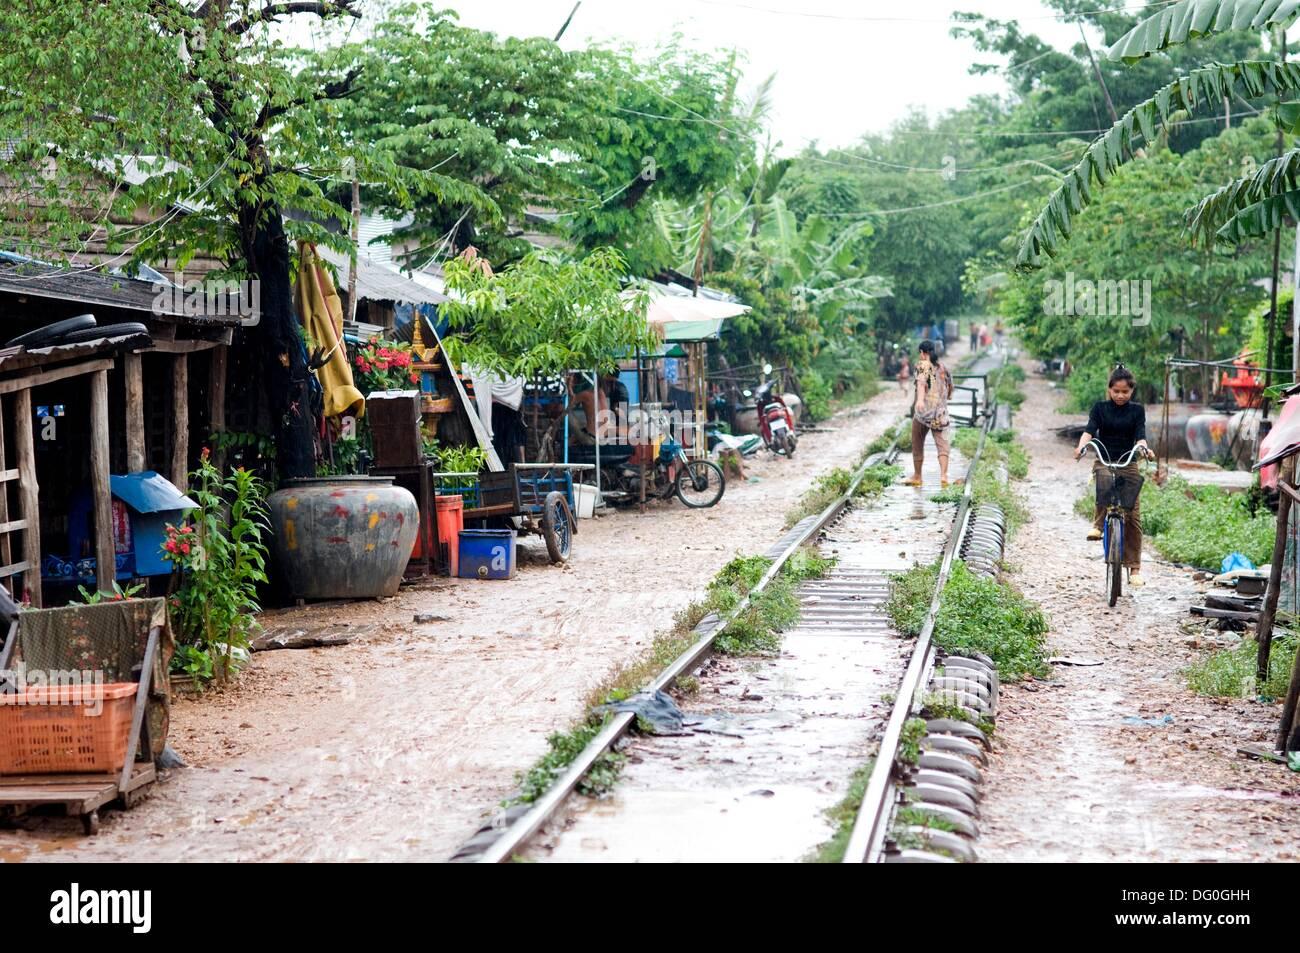 Train line, Sisophan, Cambodia, - Stock Image